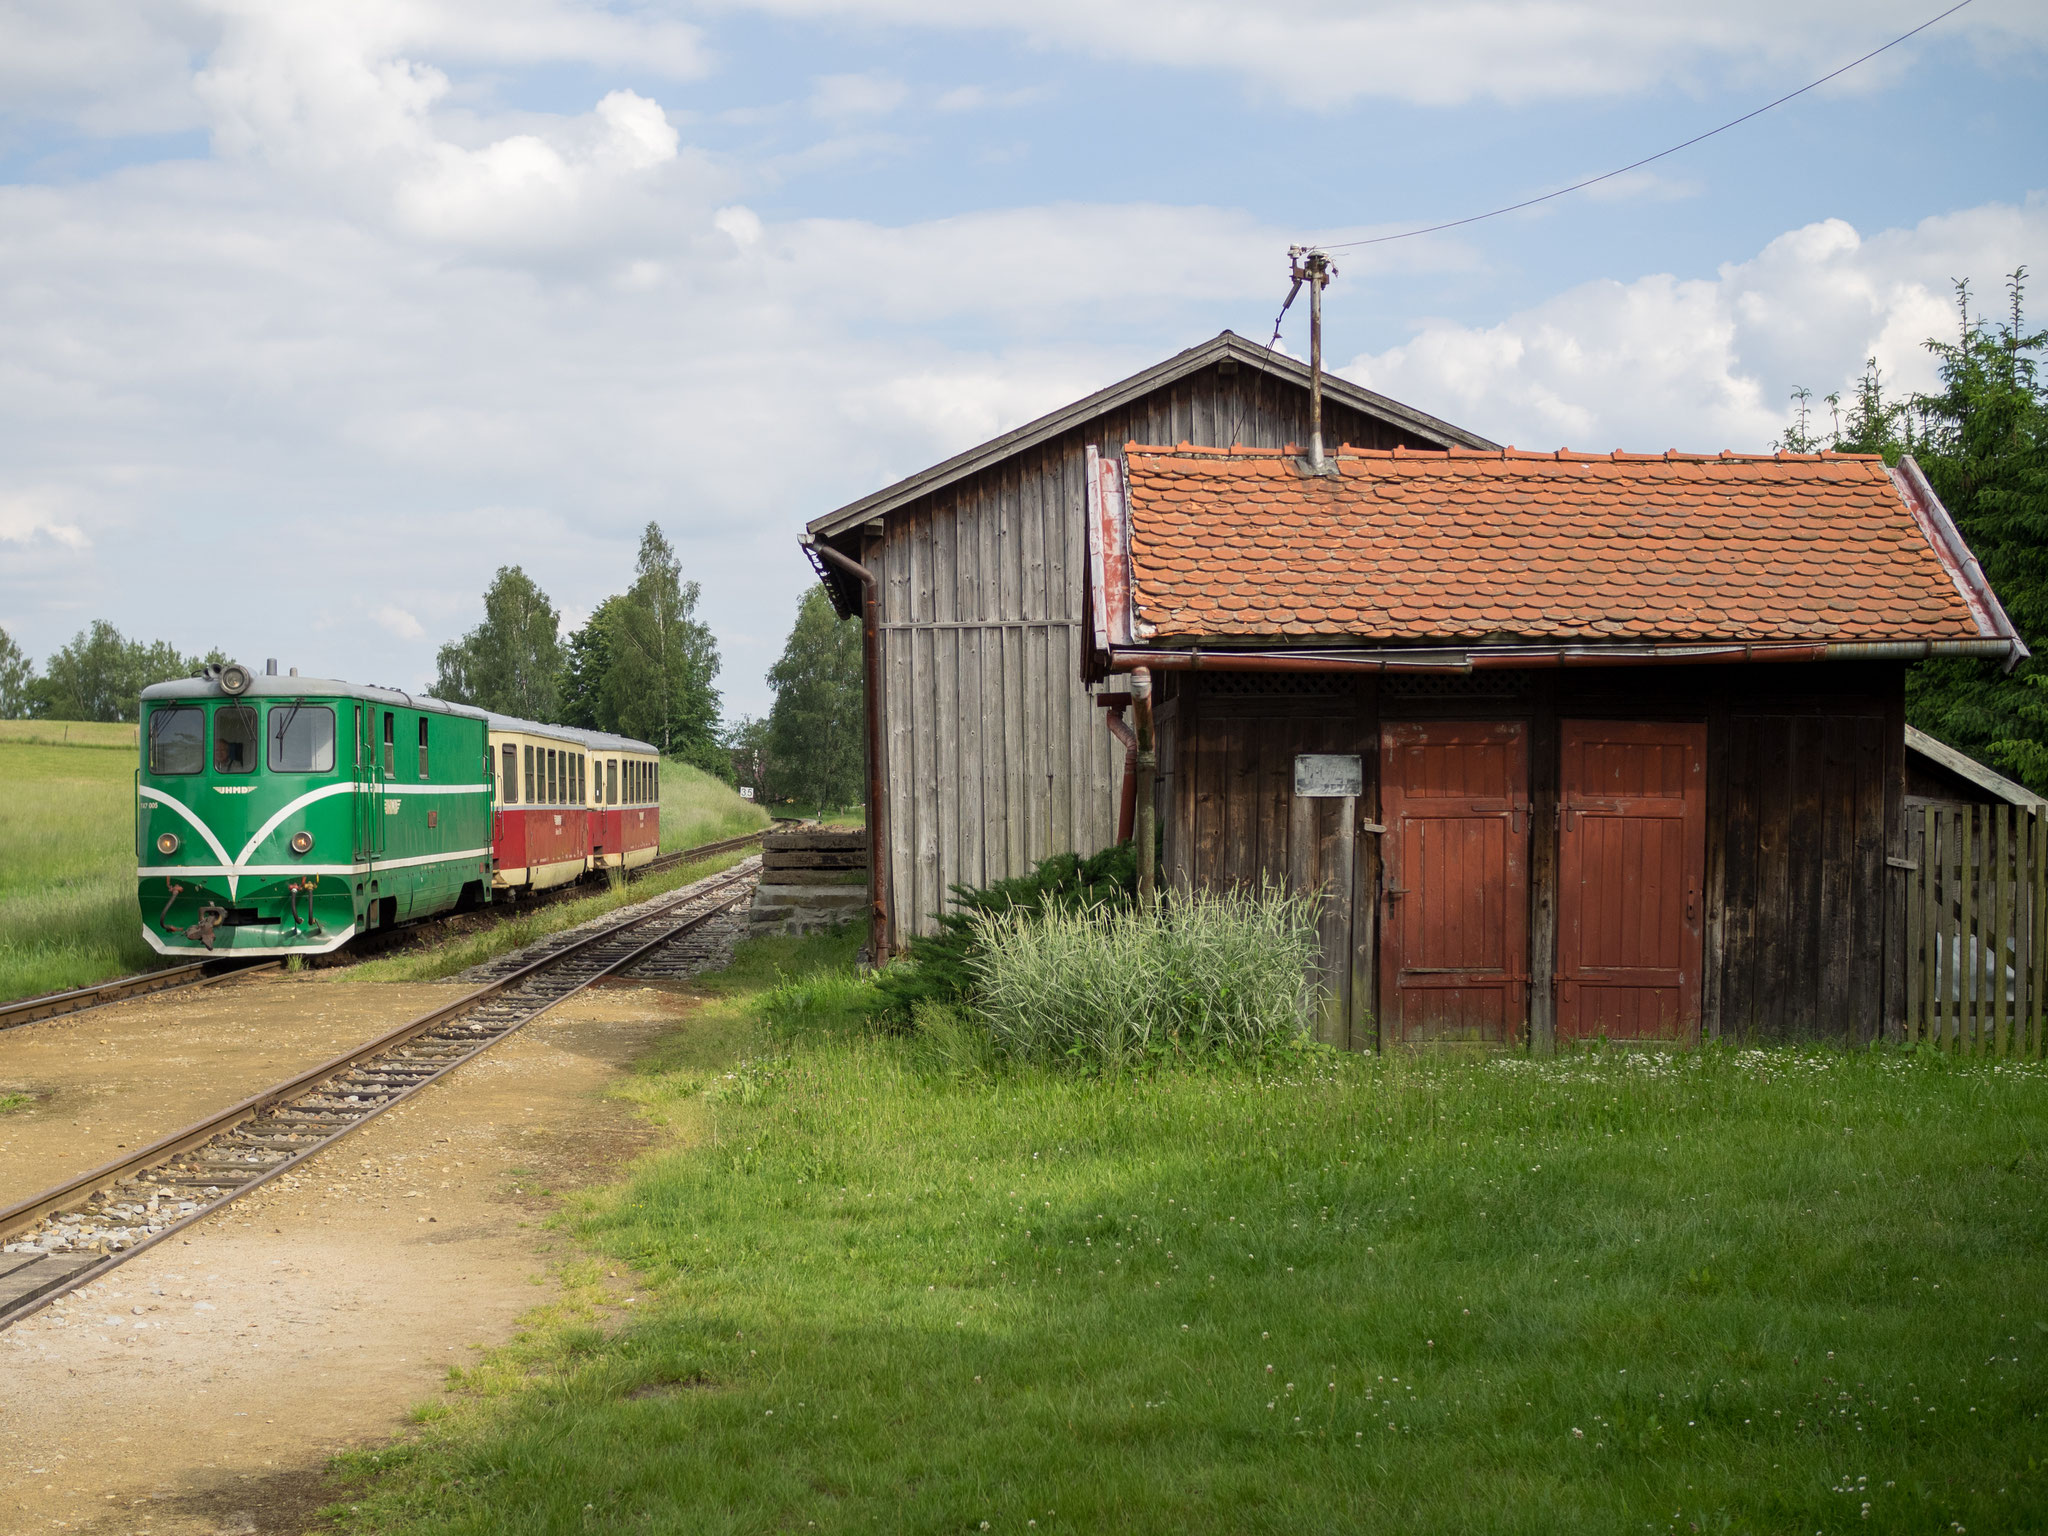 Einfahrt T47.005 in Vcelnicka